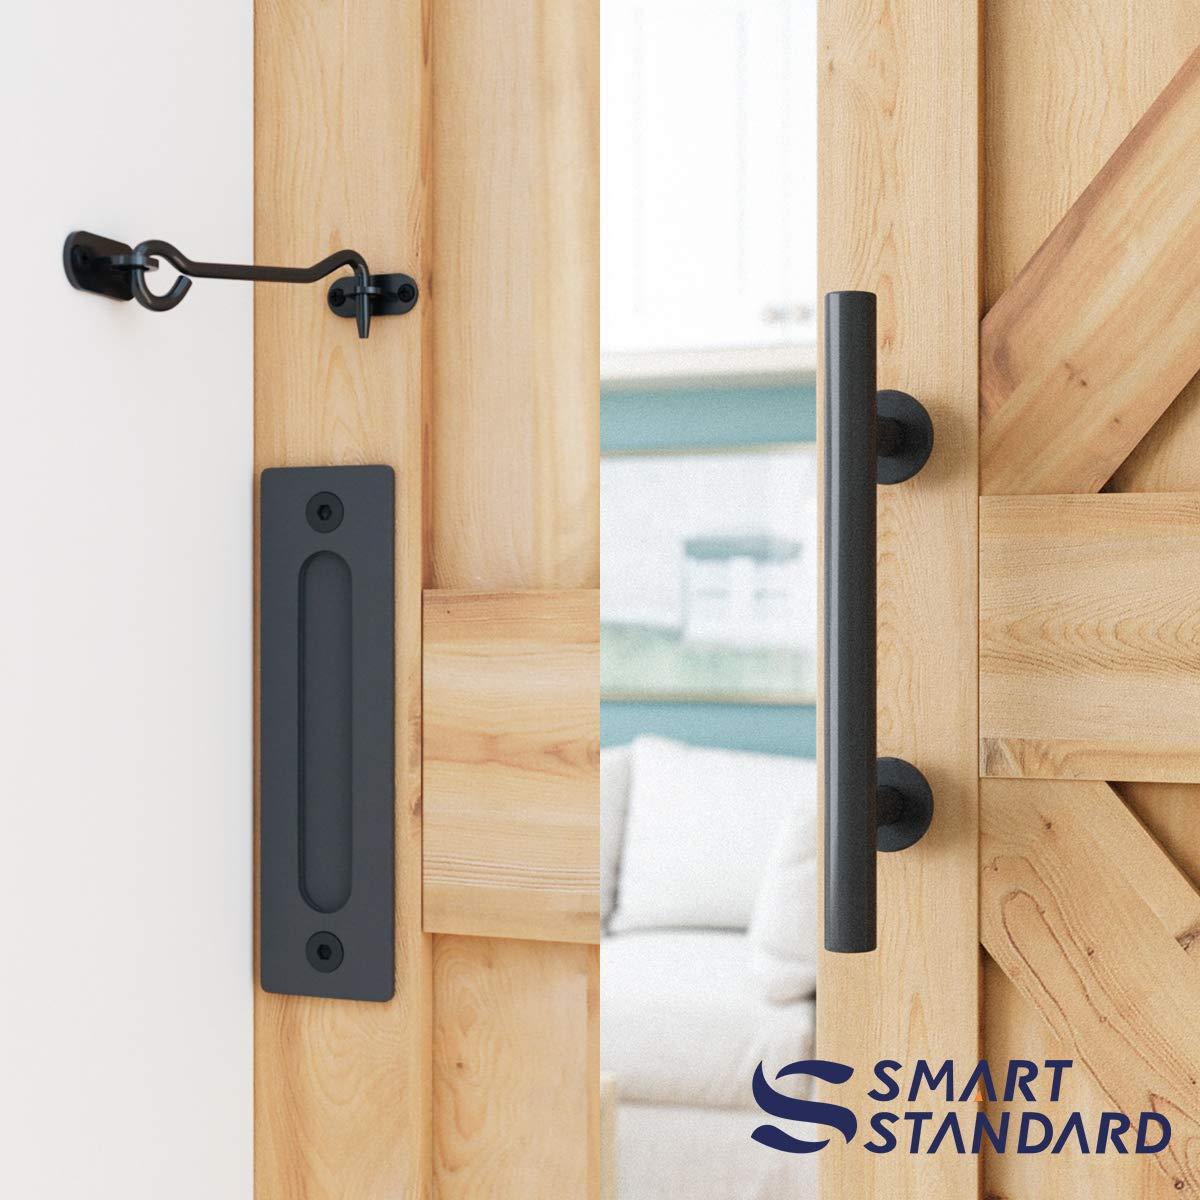 6.6 FT Heavy Duty Sturdy Sliding Barn Door Hardware Kit, 6.6ft Double Rail, Black, (Whole Set Includes 1x Pull Handle Set & 1x Floor Guide & 1x Latch Lock) Fit 36''-40'' Wide Door Panel (I Shape Hanger) by SMARTSTANDARD (Image #4)